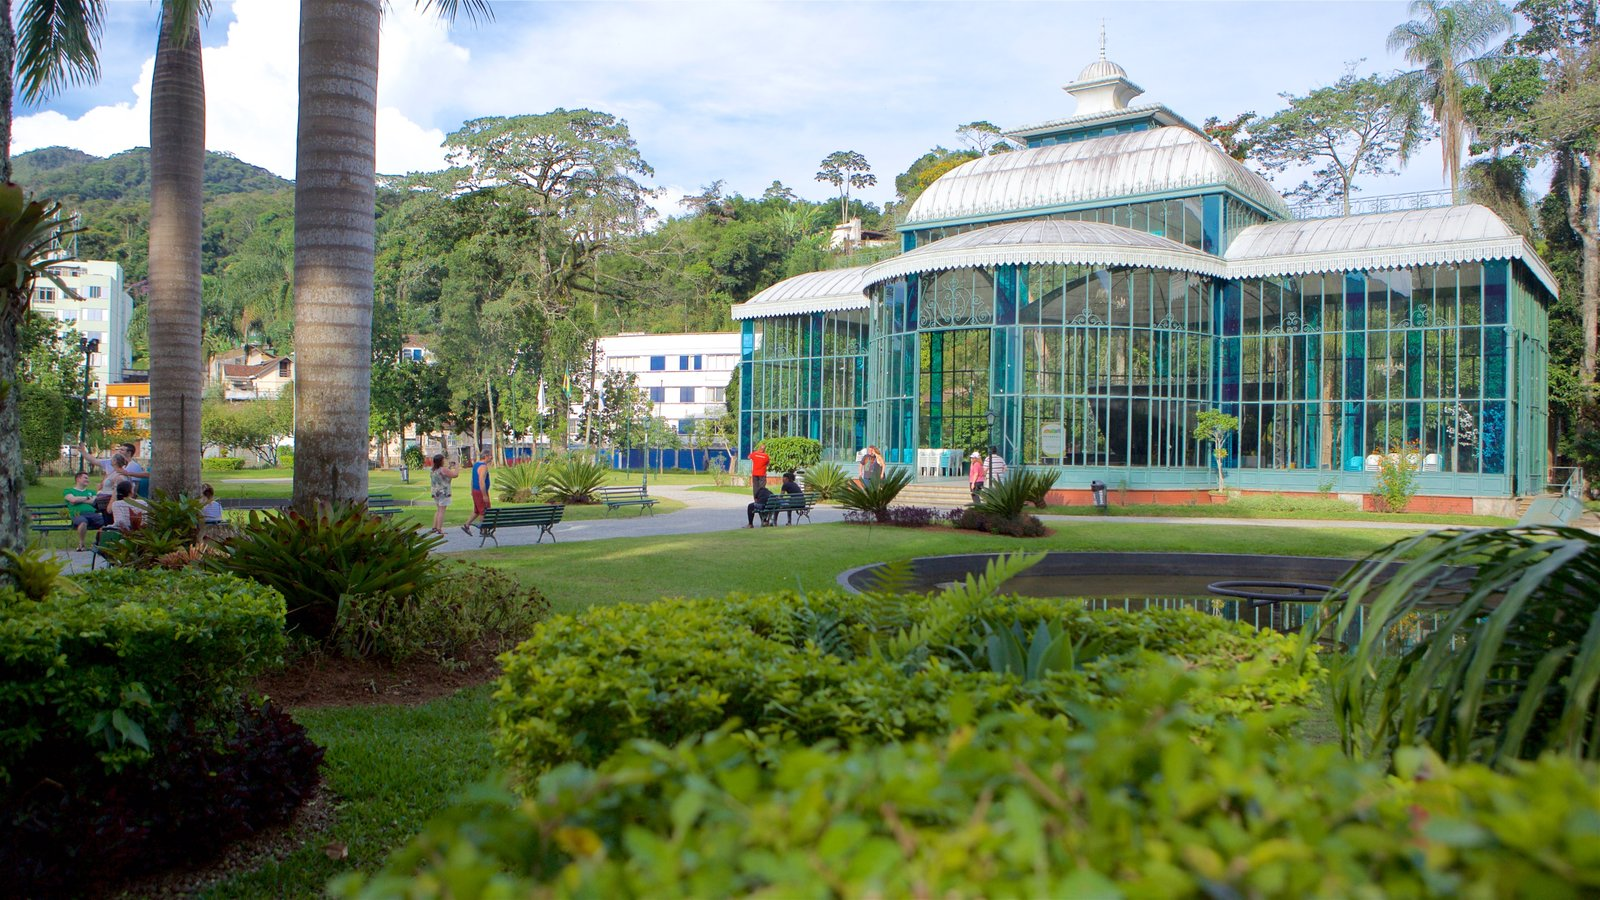 Palácio de Cristal caracterizando um parque